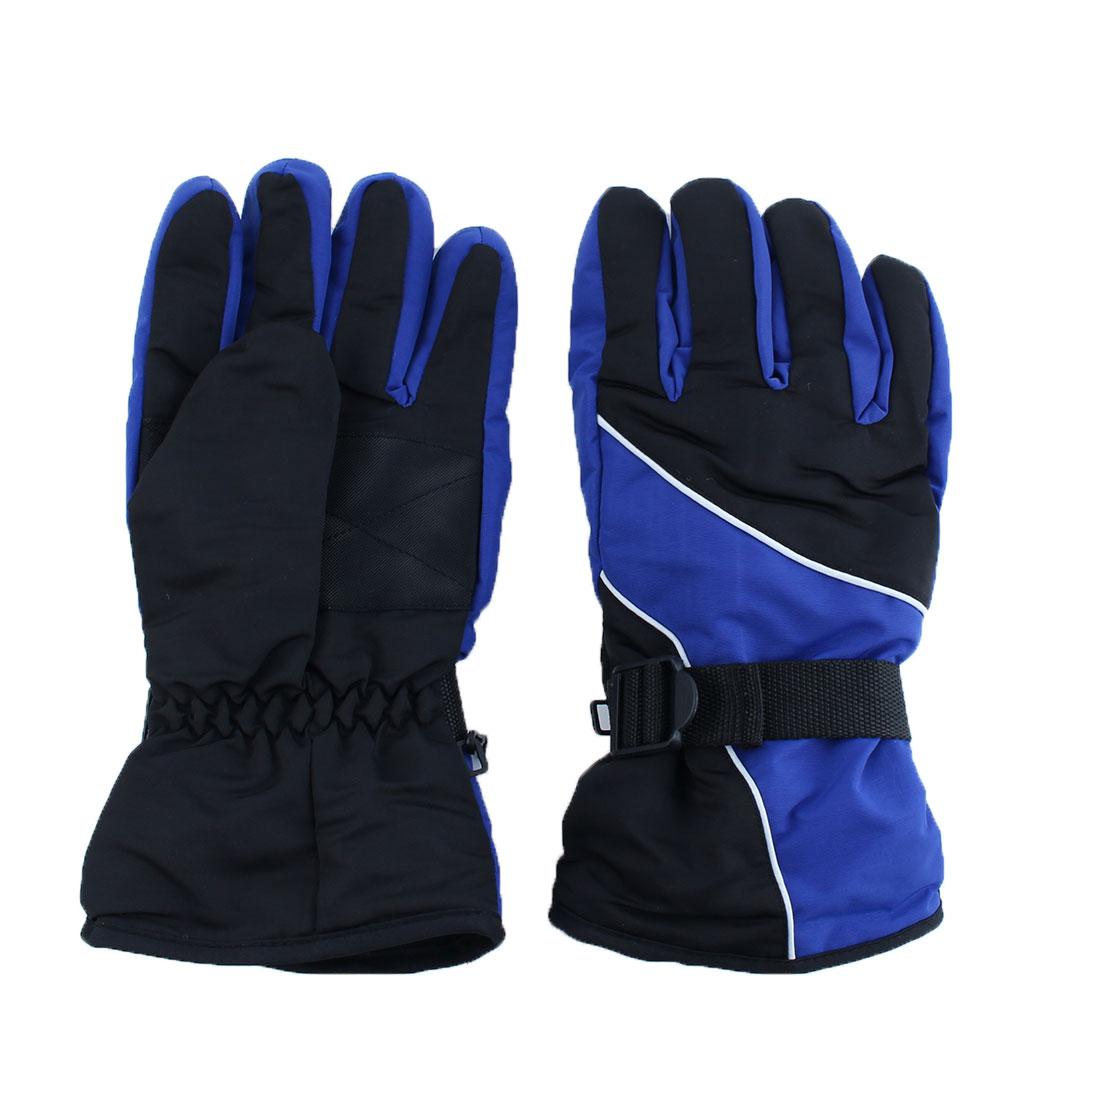 Motorcycle Climbing Winter Snowmobile Ski Gloves Athletic Mittens Dark Blue Pair